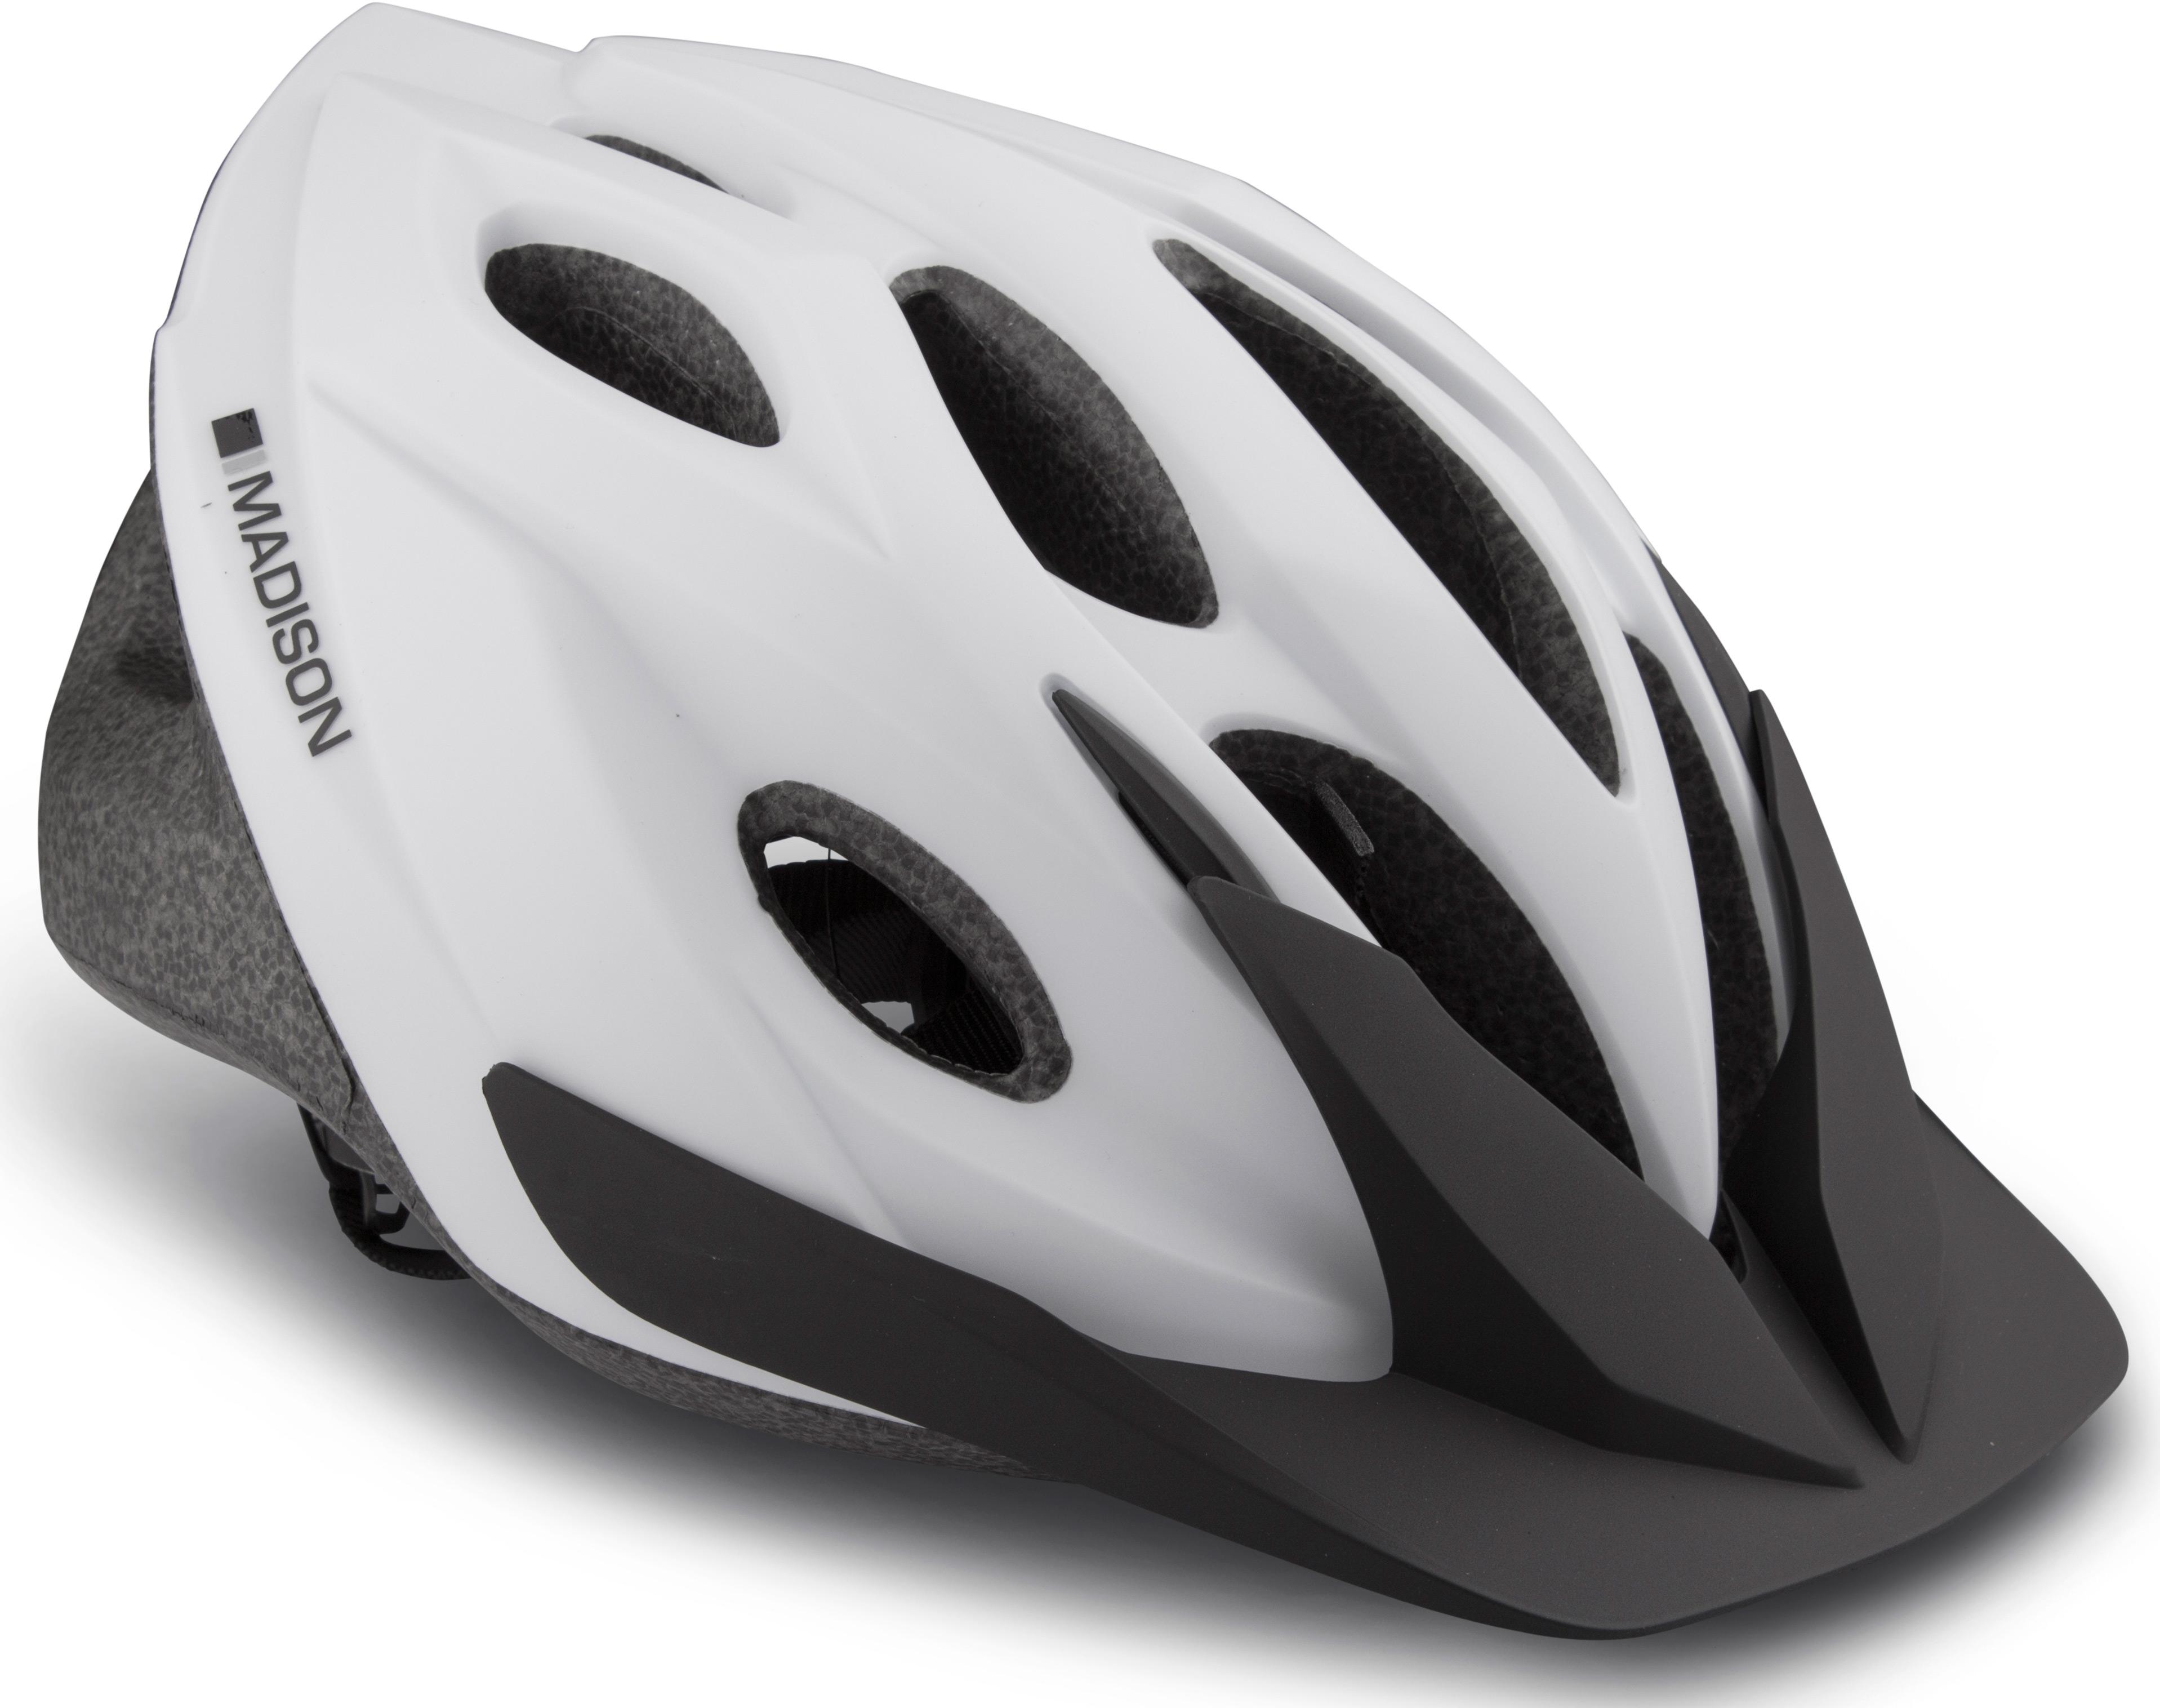 Orbea Gain D20 Ultegra Electric Road Bike 2020 Matt Black/gloss Black